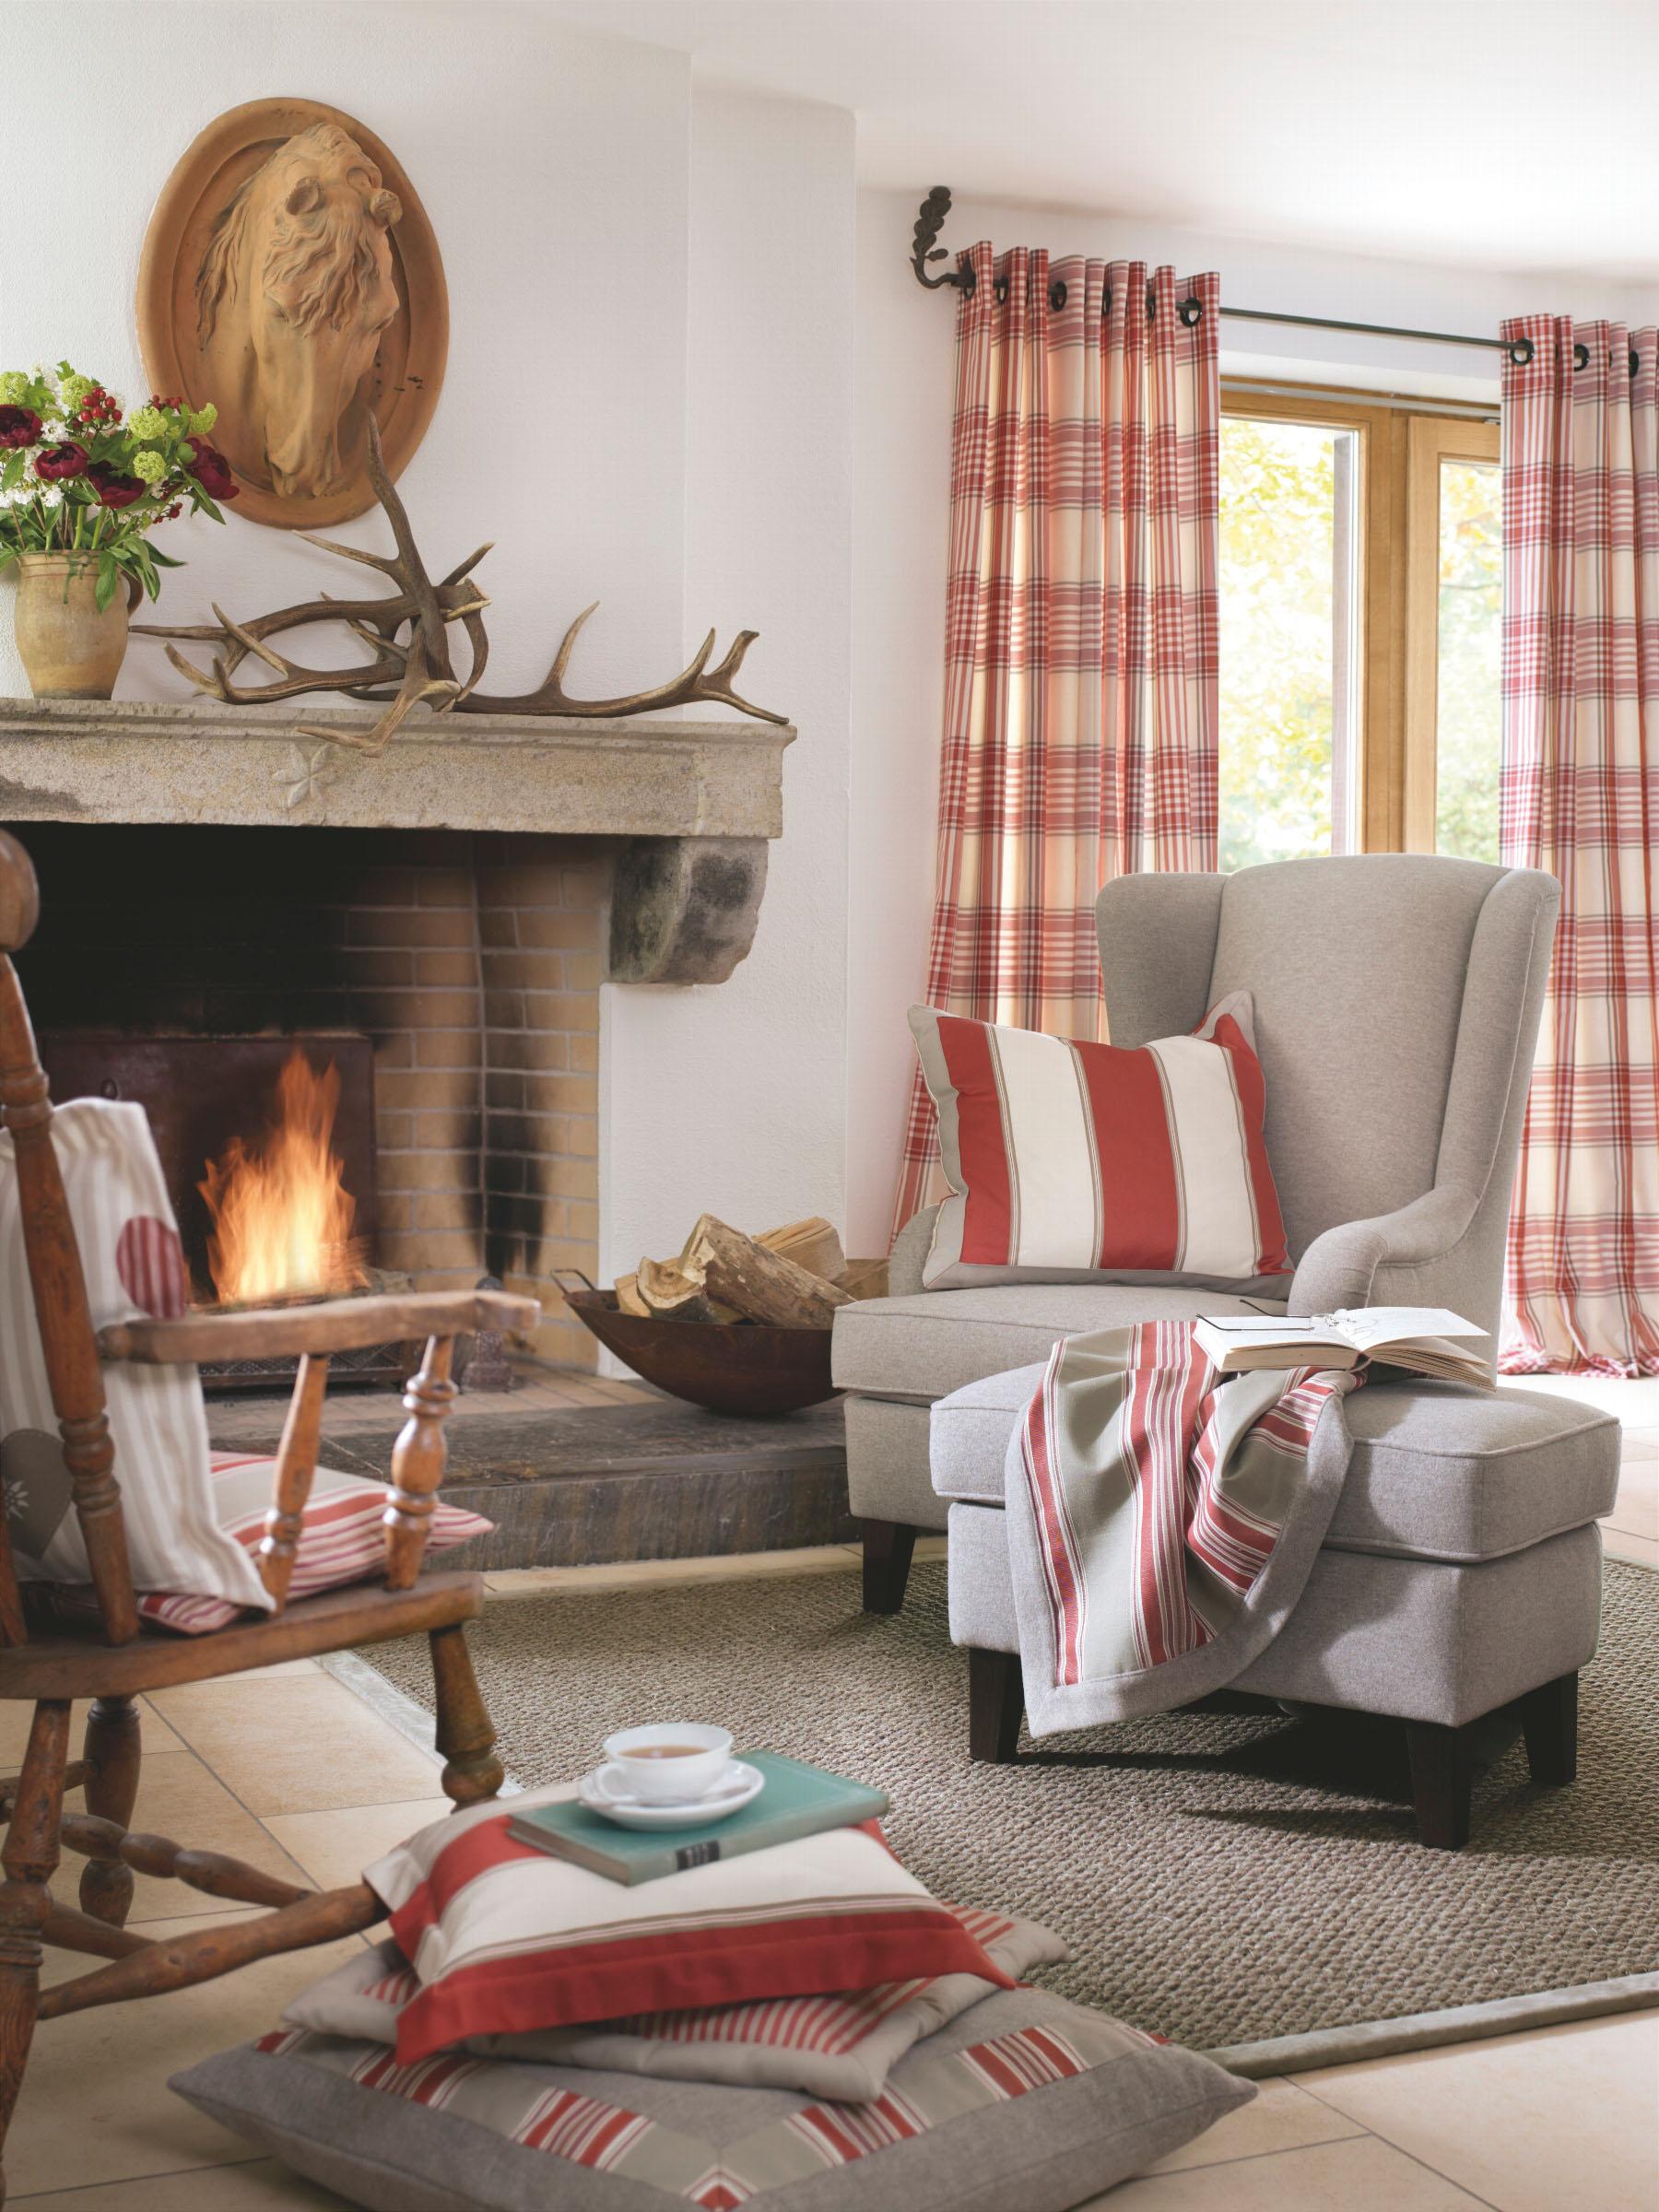 decoration fabric davos 9 7309 010 jab anstoetz. Black Bedroom Furniture Sets. Home Design Ideas